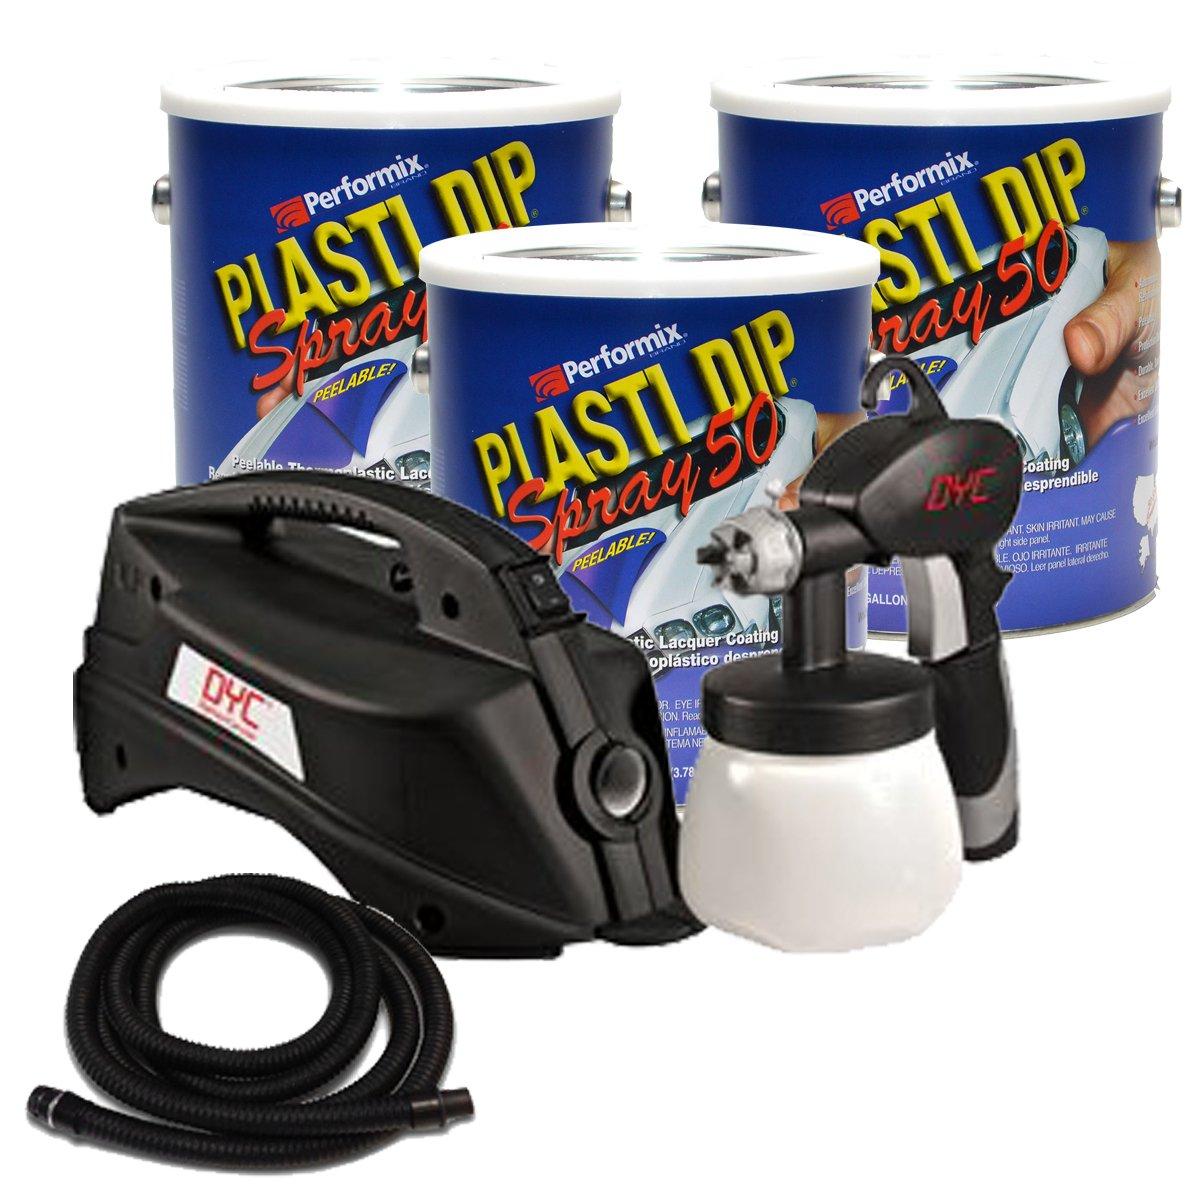 Bundle - 4 Pieces - Plasti Dip Low VOC 3 Gallon Basic Car Kit - Anthracite (California Legal)